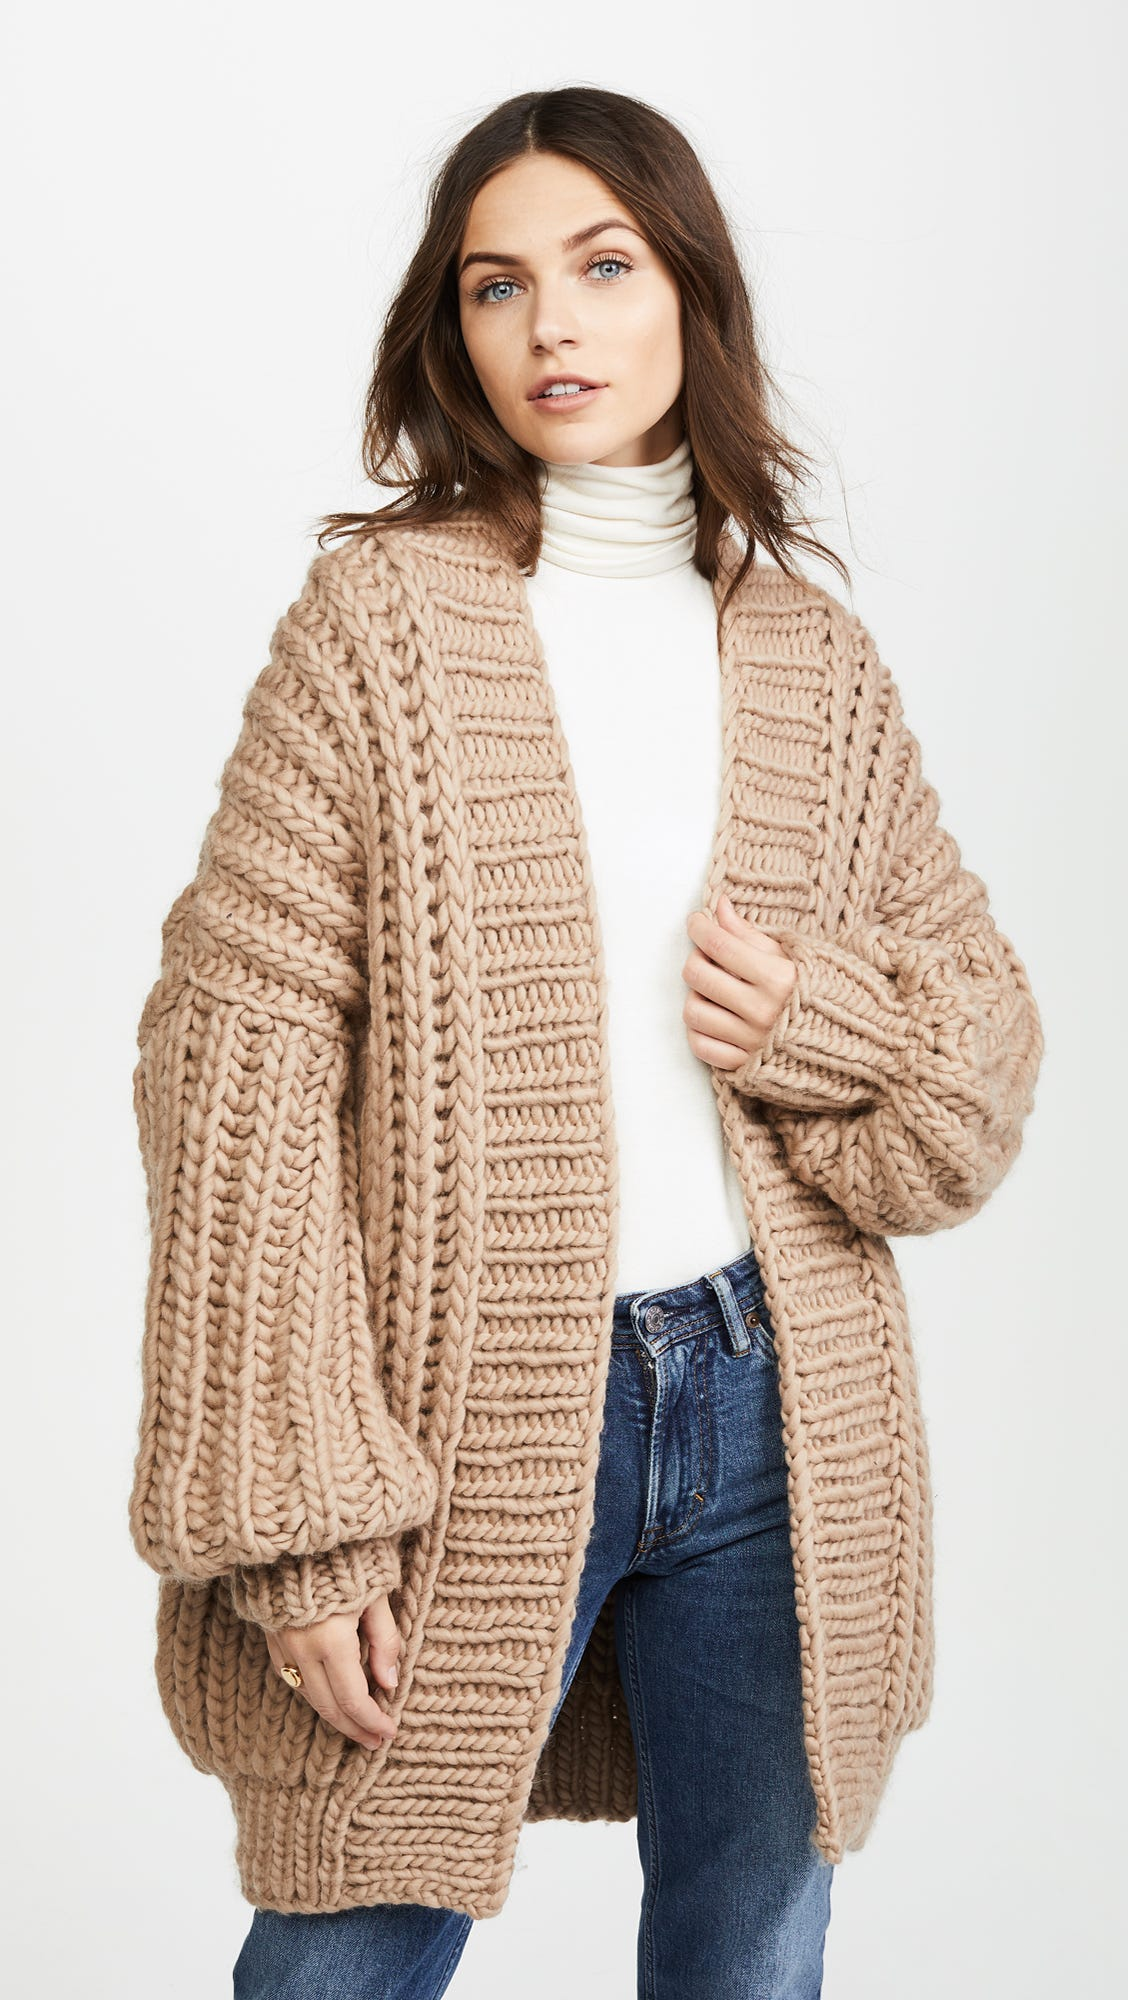 Long Cardigan Sweaters Fall 2017 Trend 7f236ae4f